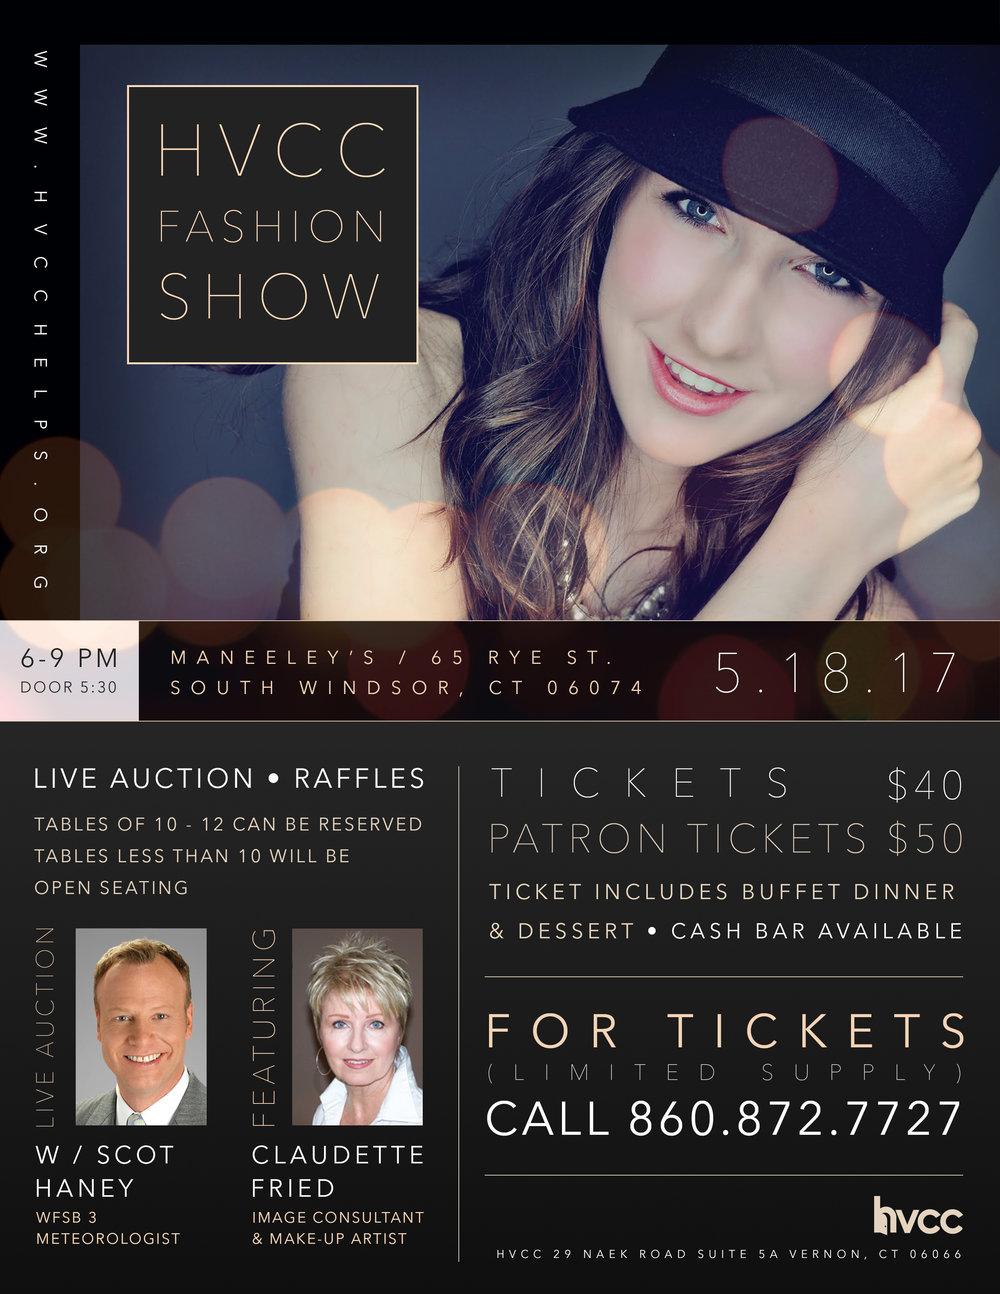 HVCC fashion show promotion • Print/Web